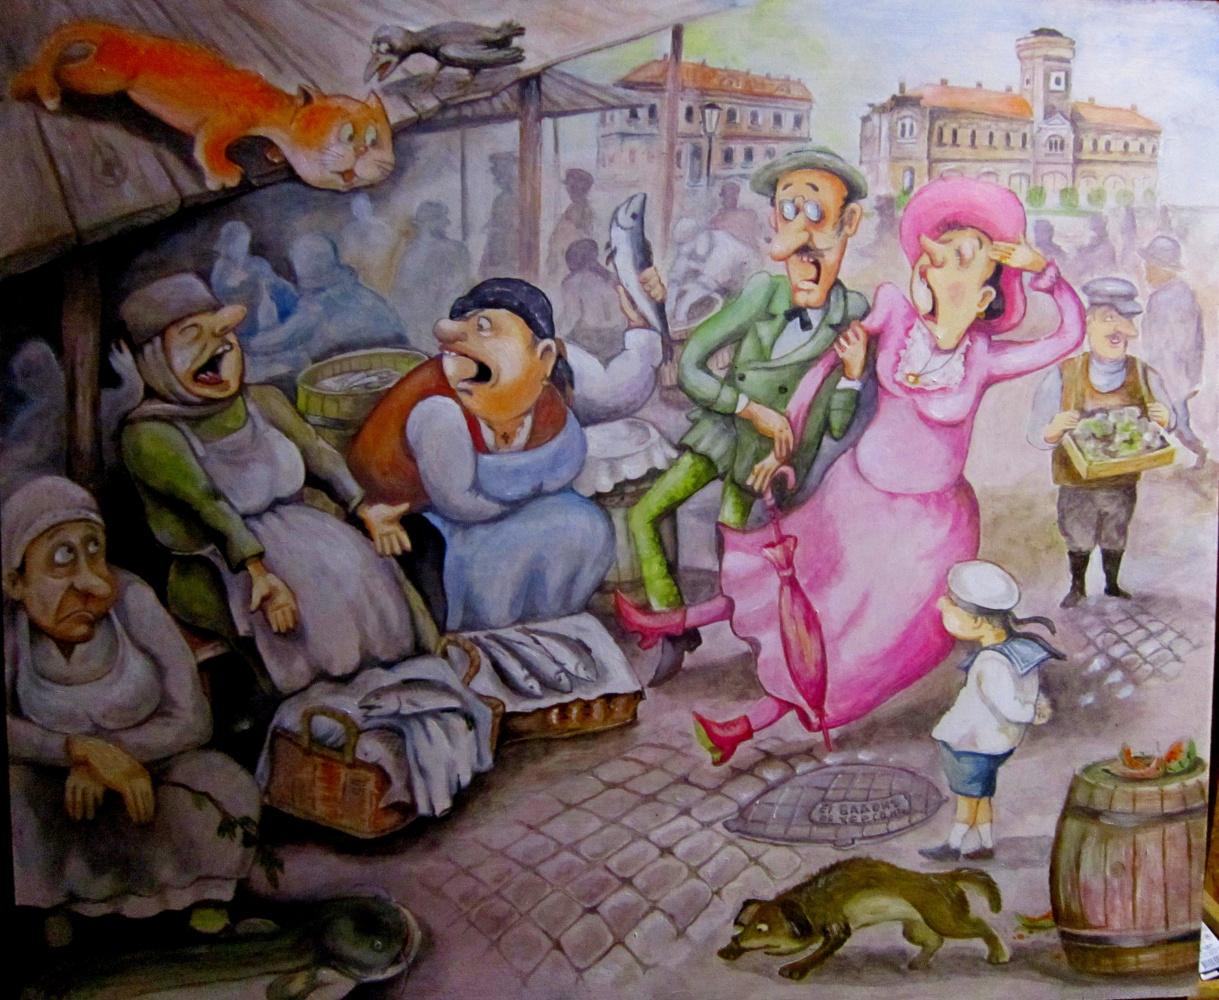 Victor Adolfovich Hop. Fish market in Old Kherson